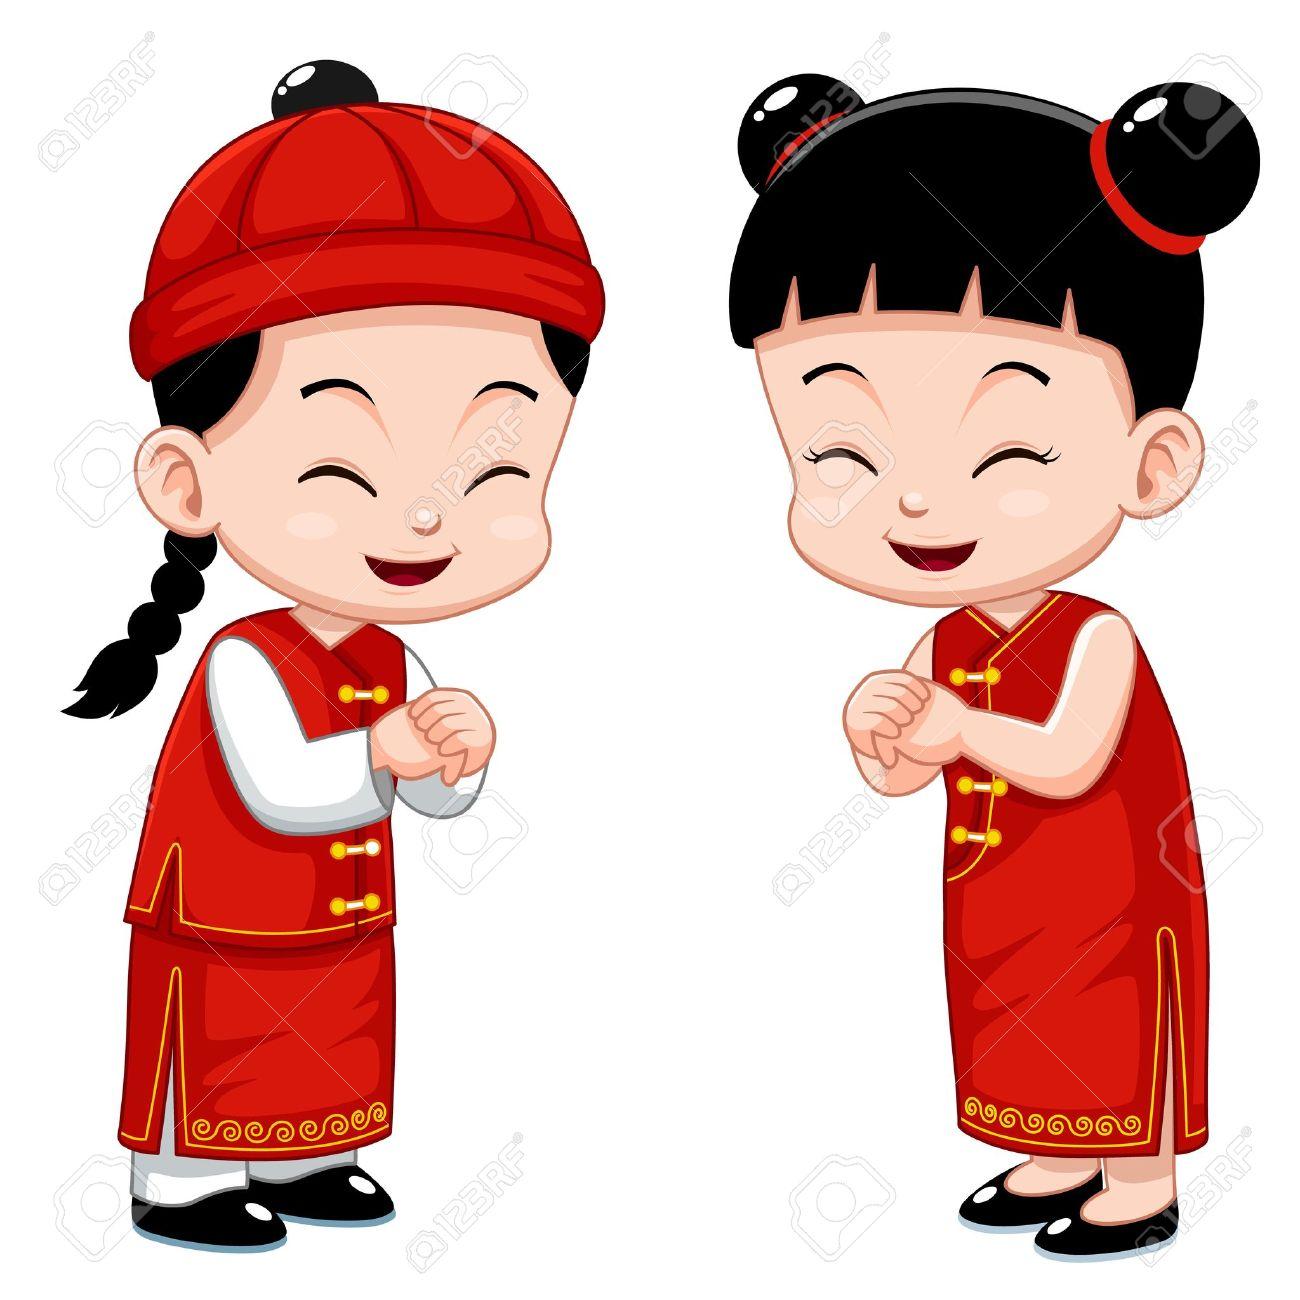 Chinese language - Simple English Wikipedia, the free encyclopedia